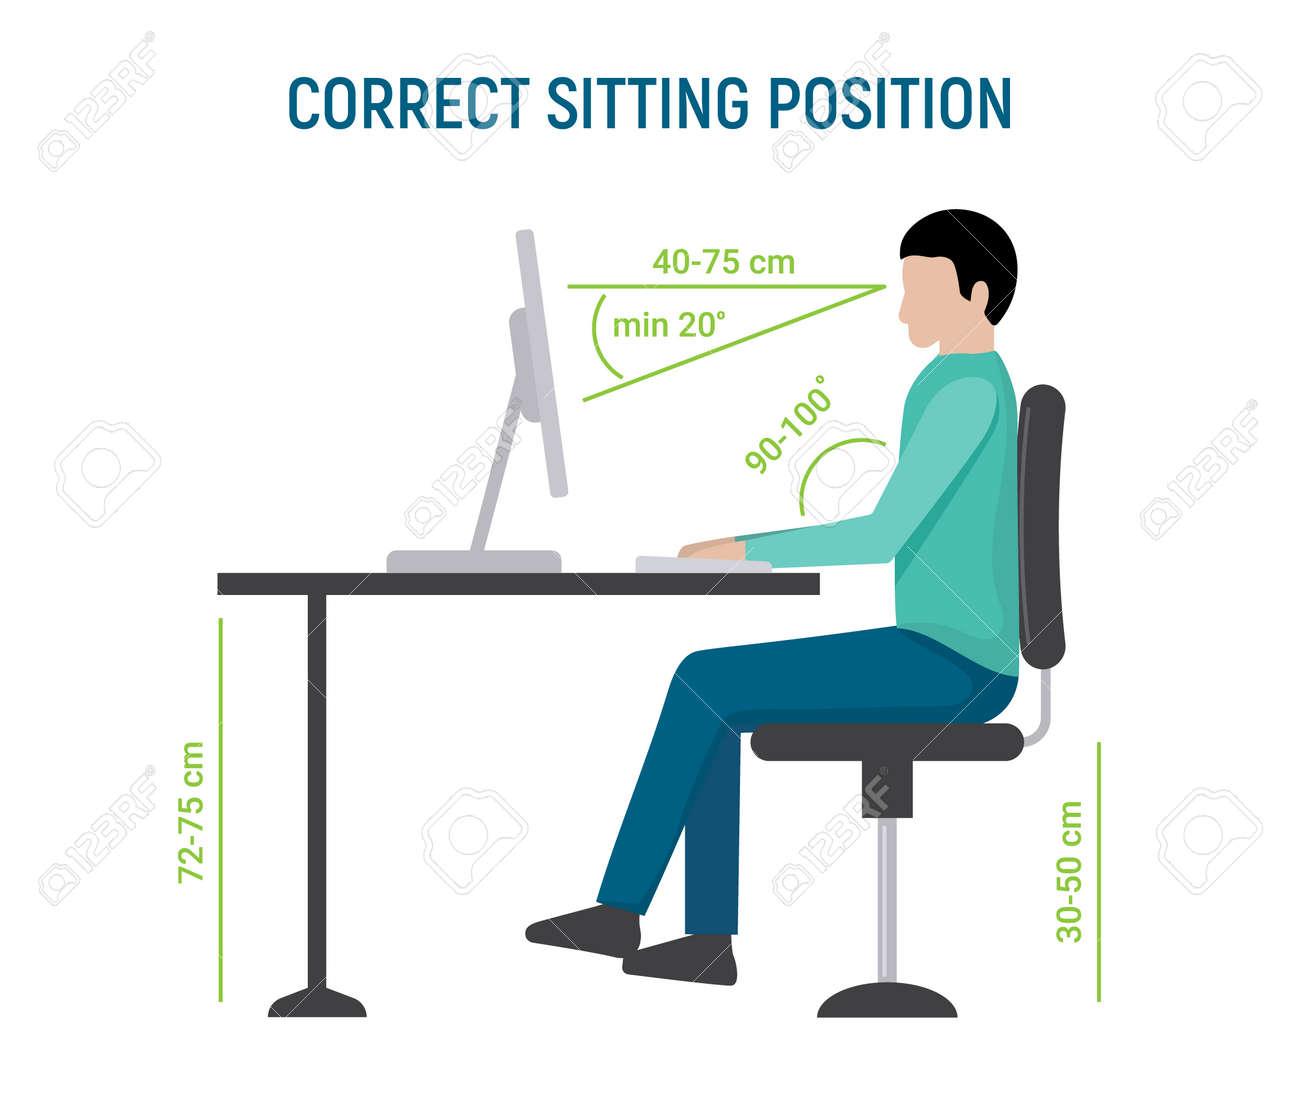 Correct sit position posture. Ergonomic computer desk correct posture business pose - 168952879